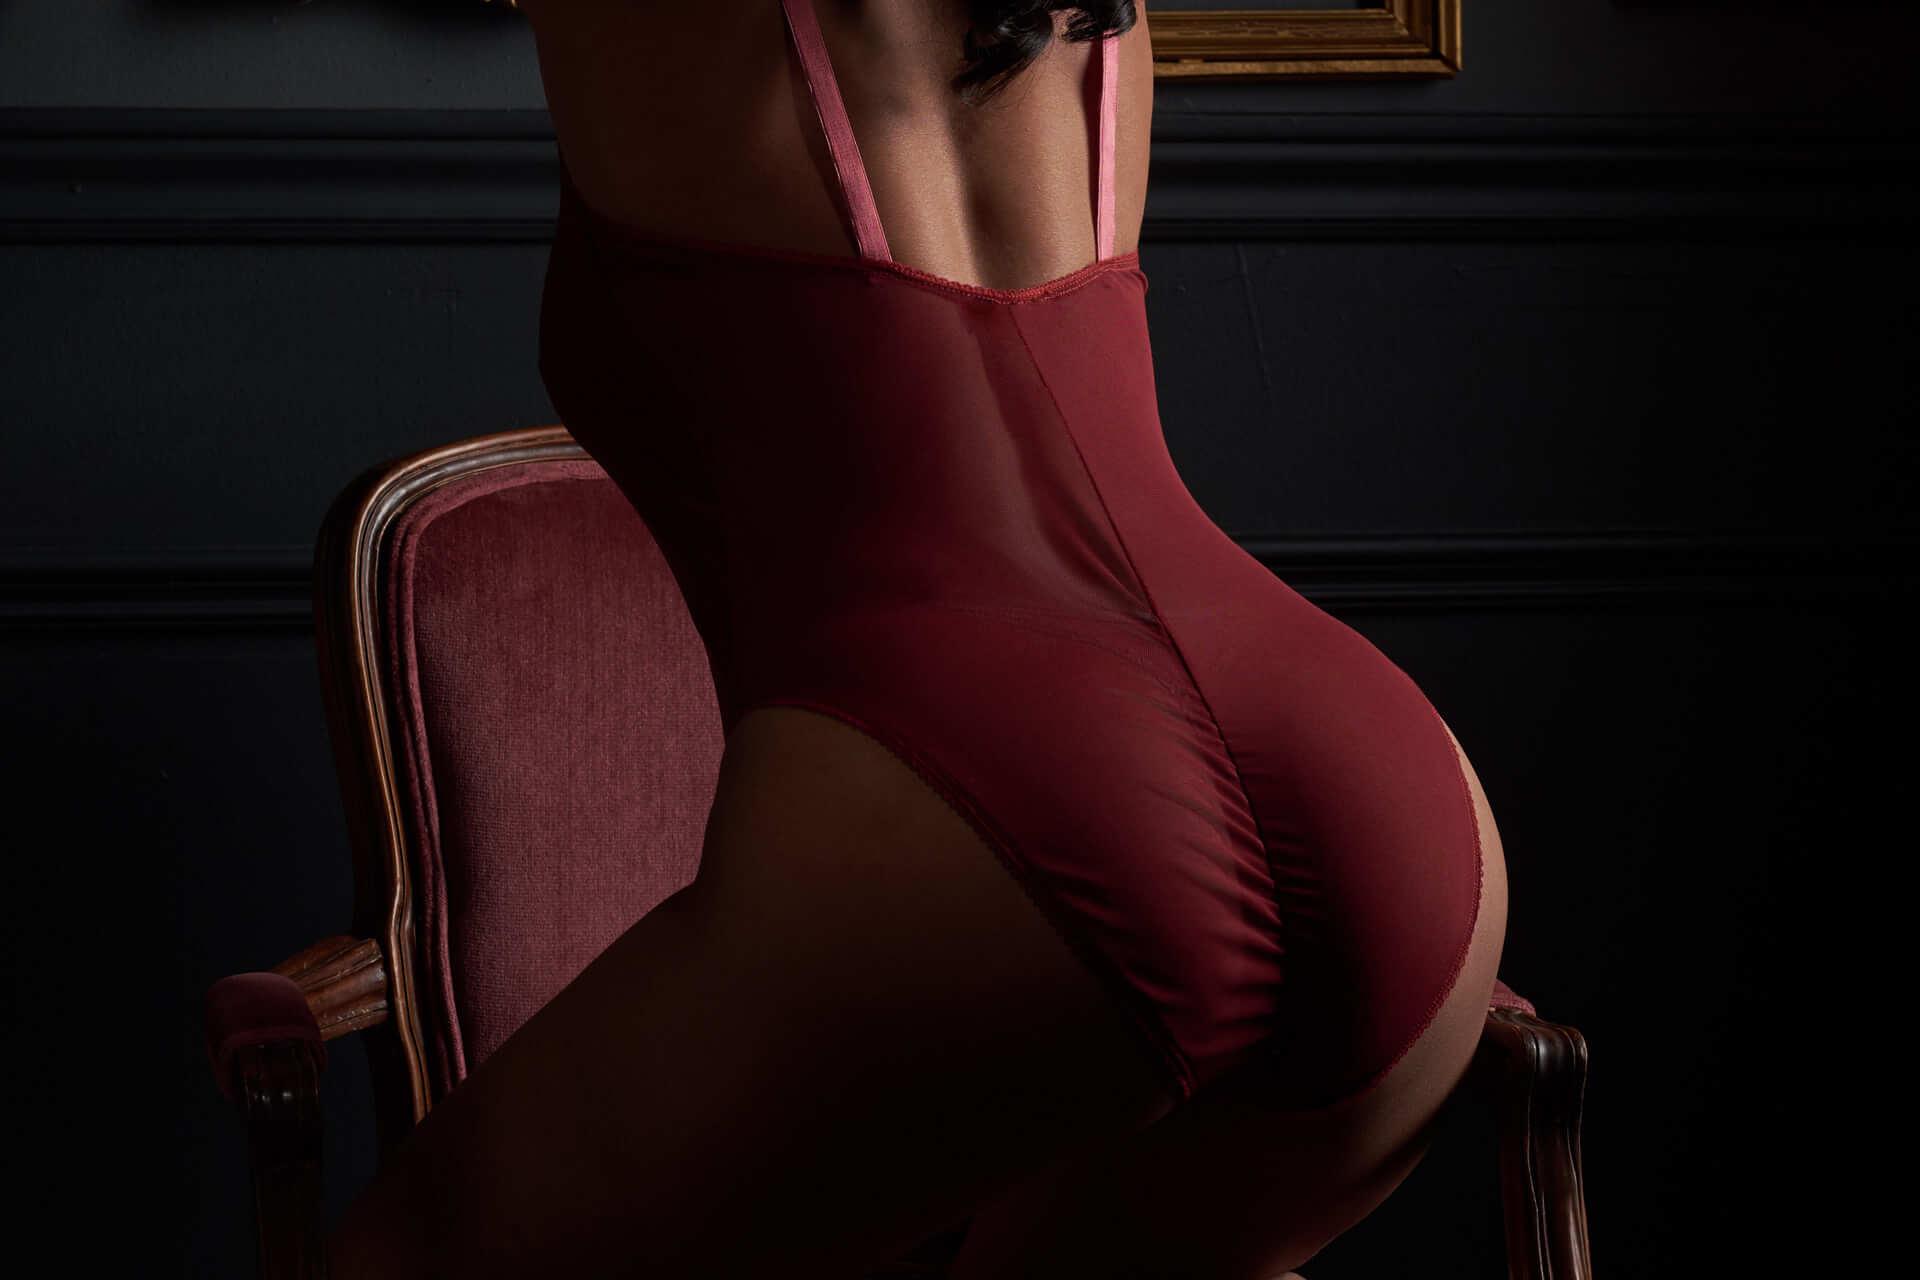 boudoir toronto studio professional lingerie sexy intimate underwear sensual nude photography